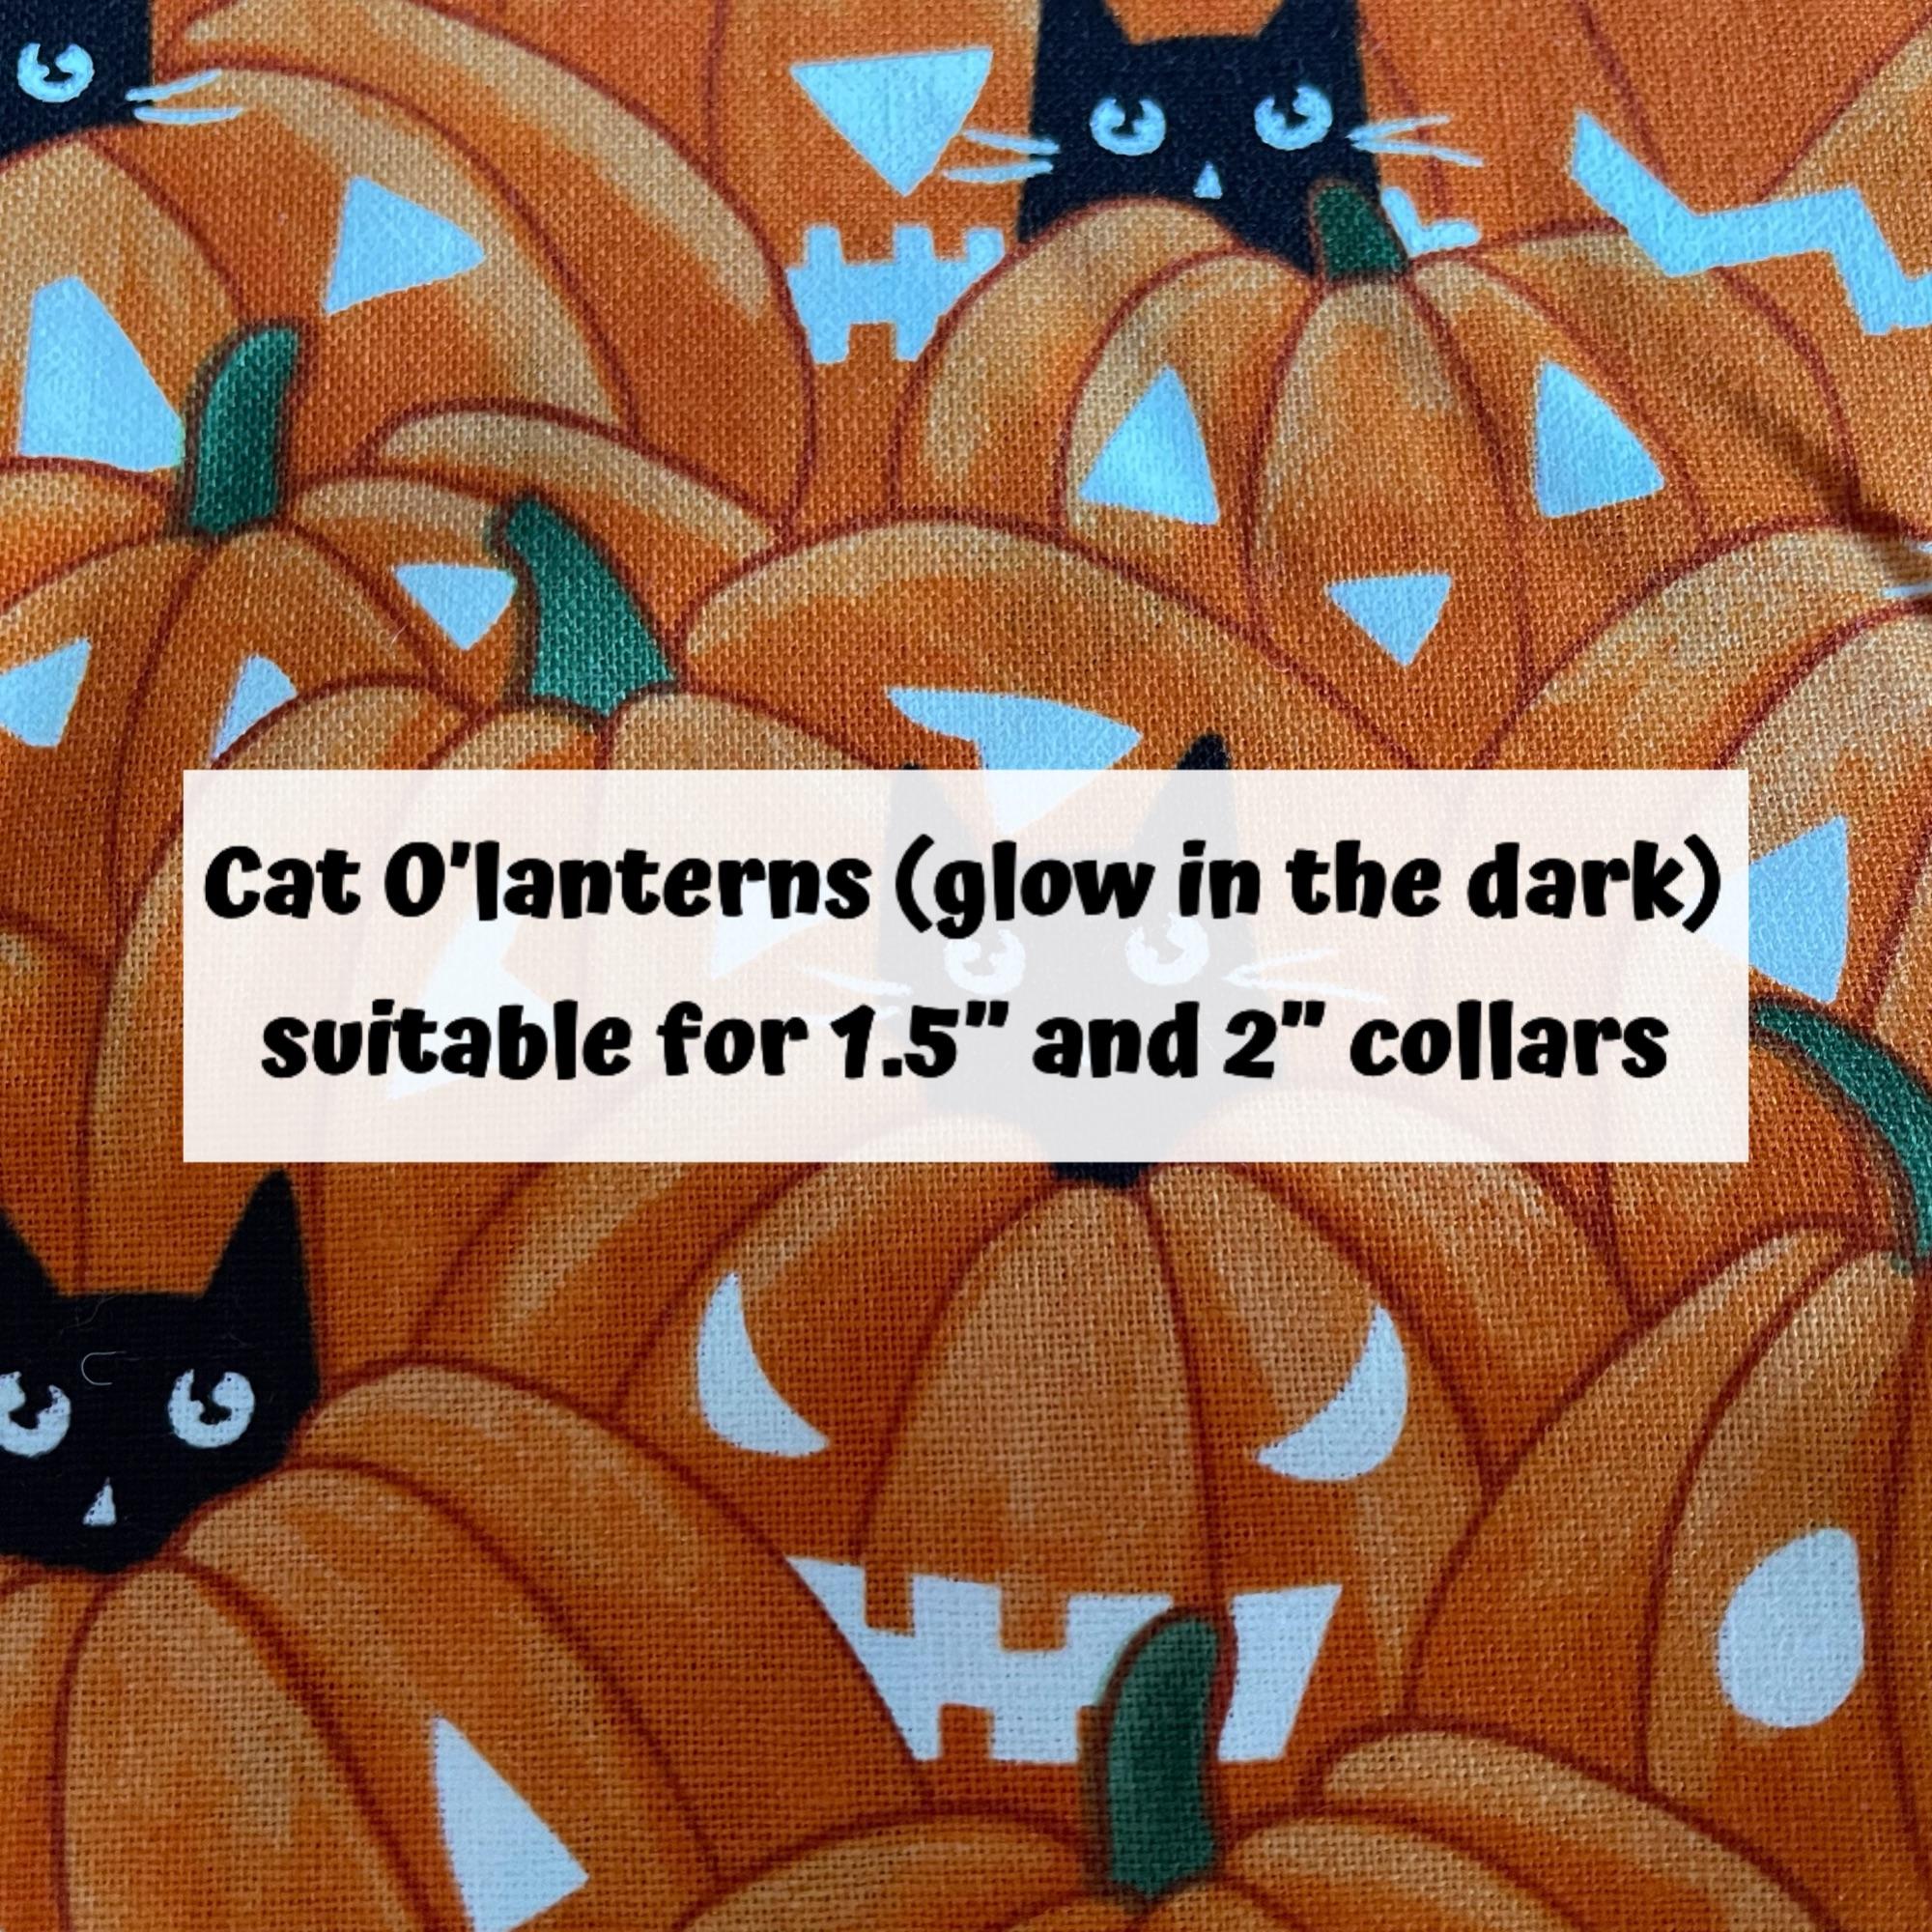 Cat O'Lanterns (glow in the dark)